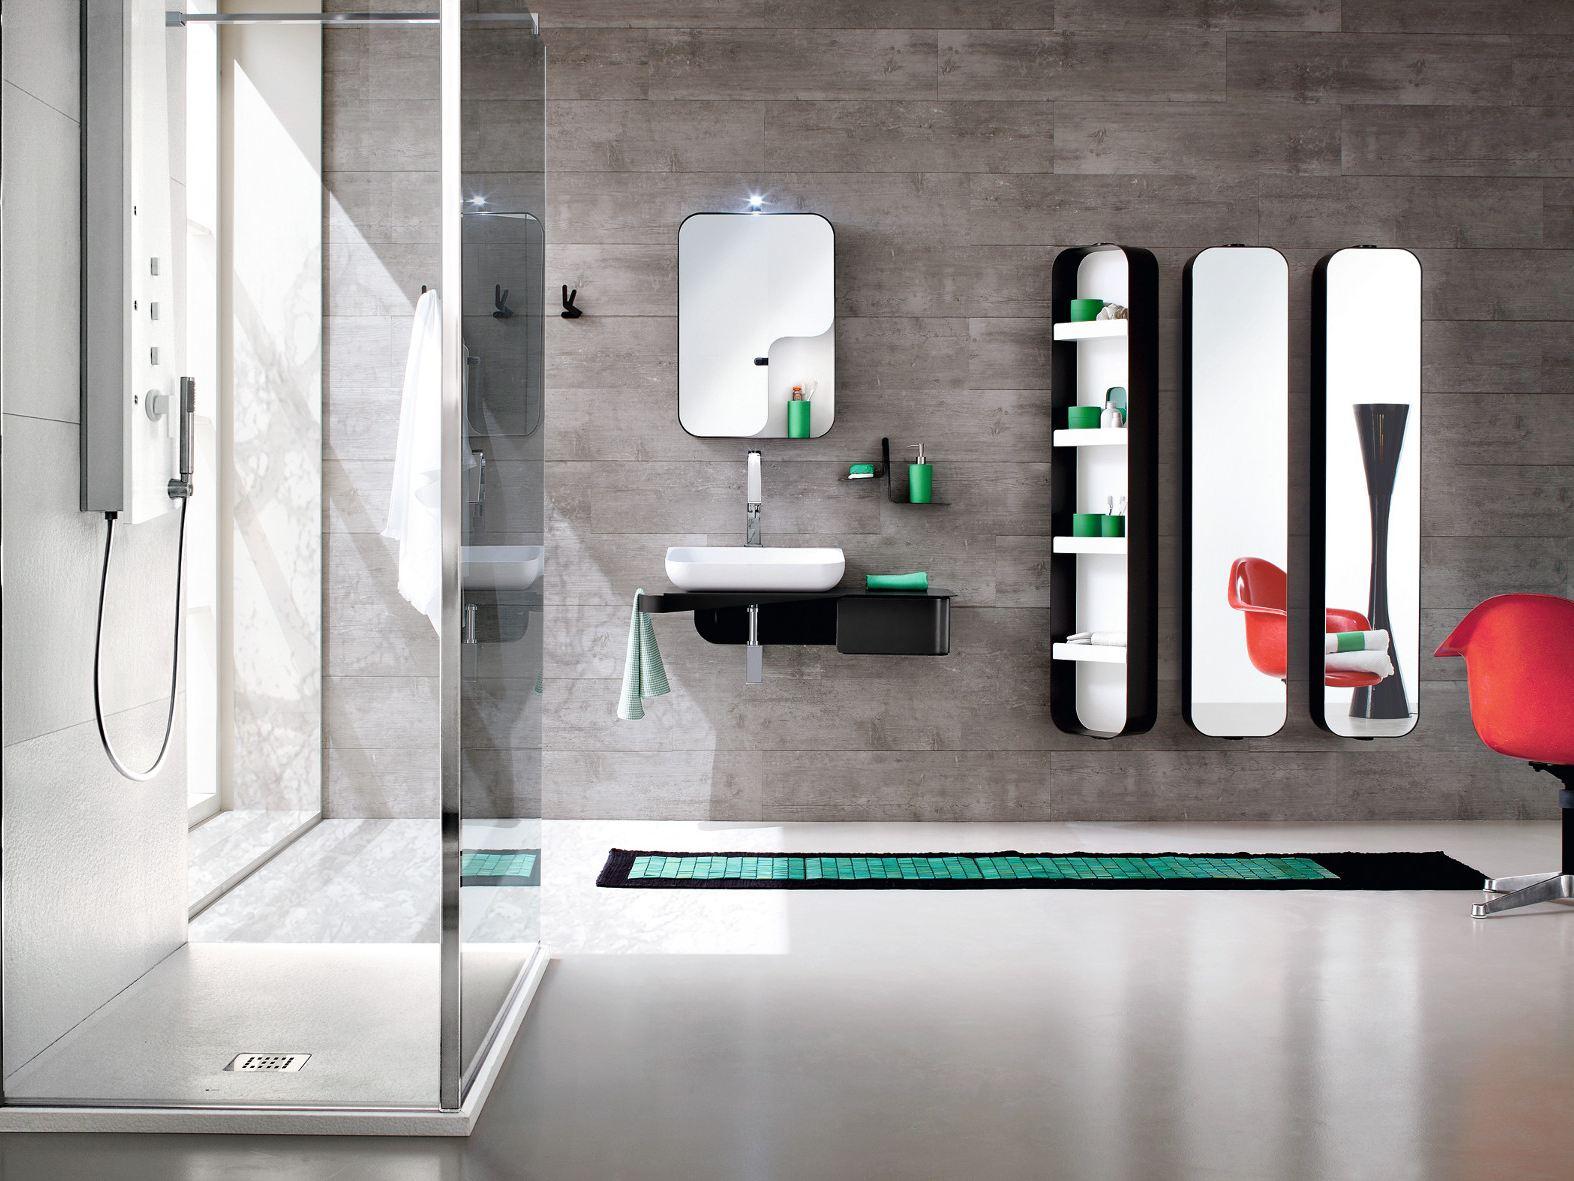 gallery mobili bagno arblu - daripa lecce - Arblu Arredo Bagno